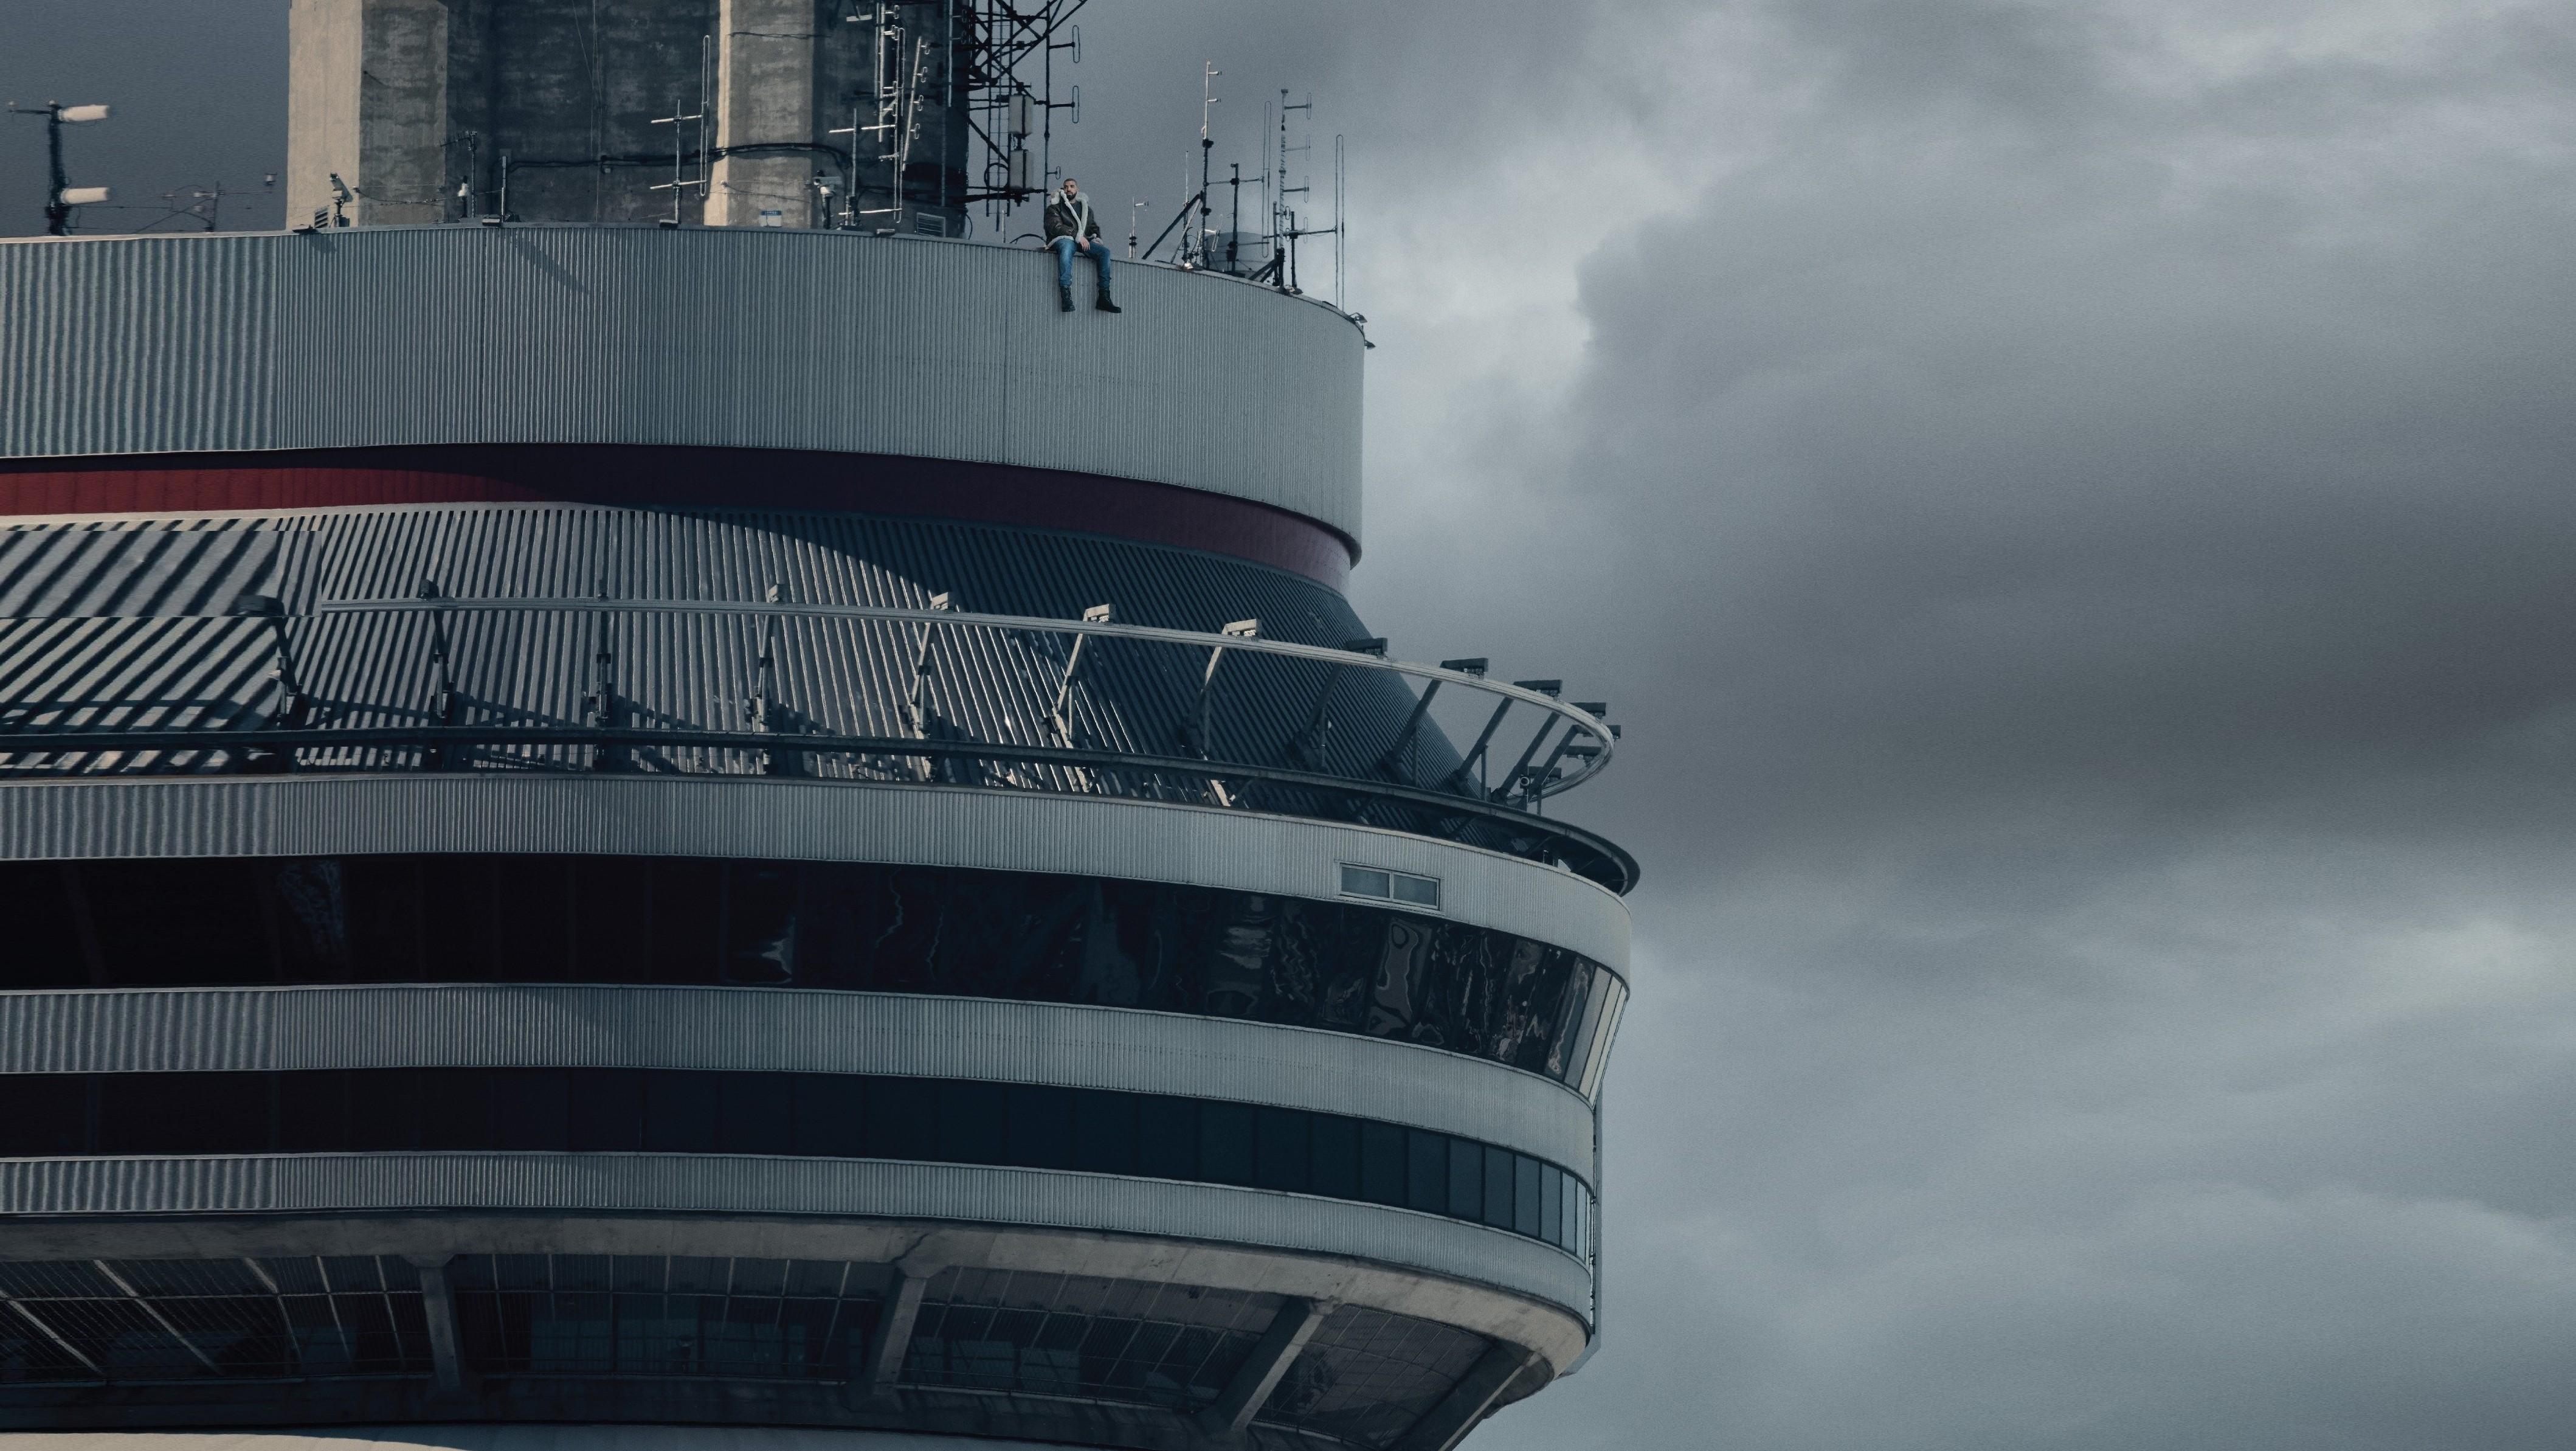 Beautiful Wallpaper Macbook Drake - drake-4237x2386-views-top-music-artist-and-bands-hip-hop-10611  Gallery_439545.jpg